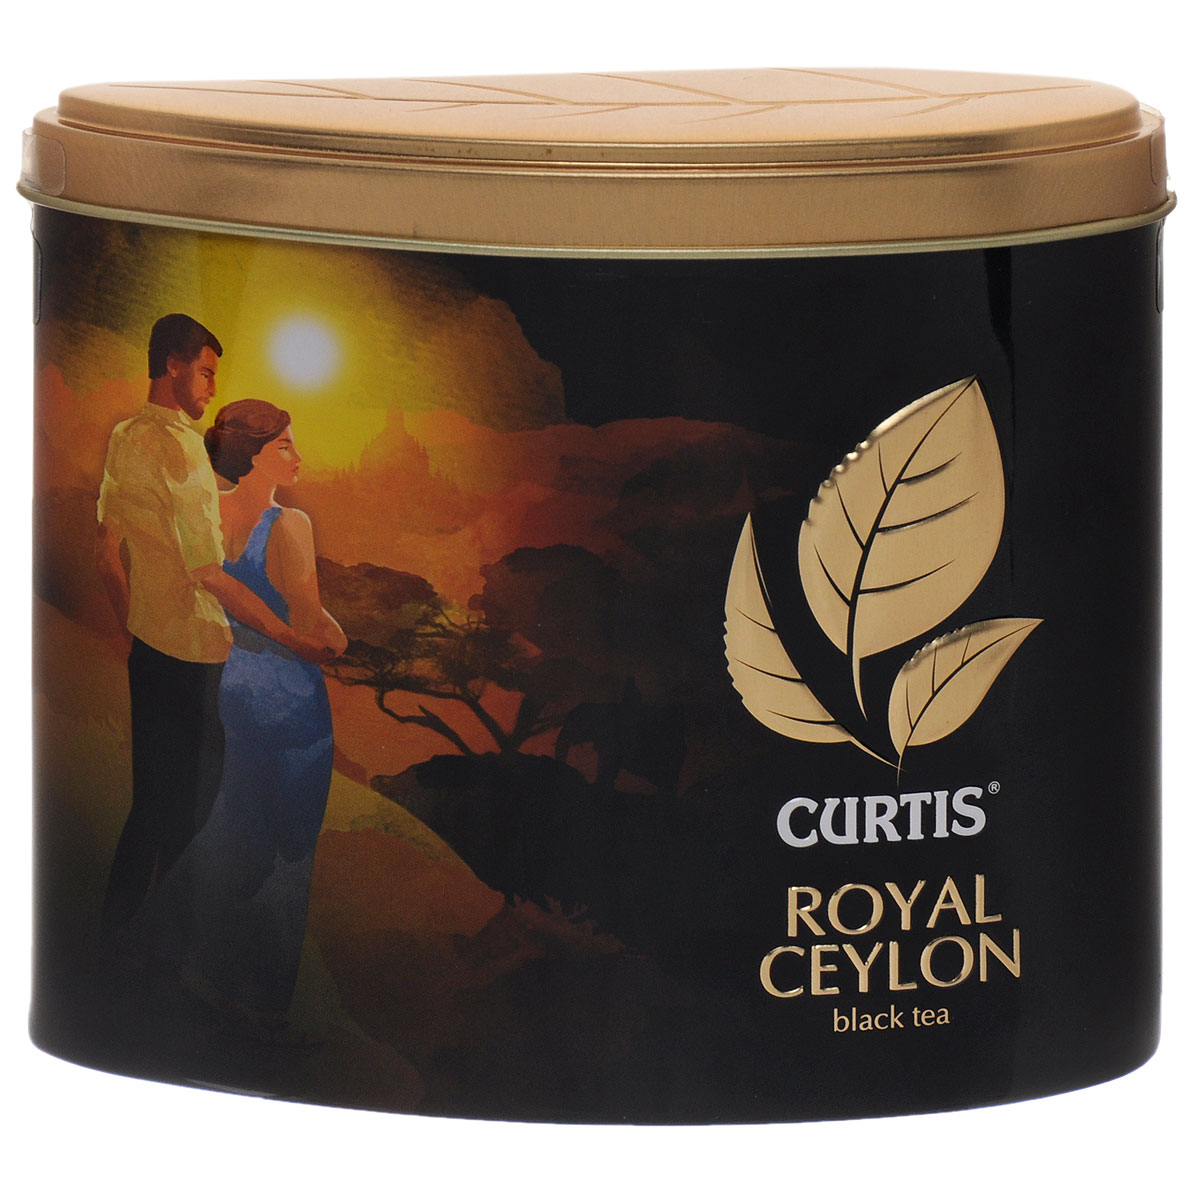 Curtis Royal Ceylon черный листовой чай, 80 г0120710Curtis Royal Ceylon - крупнолистовой цейлонский черный чай. Высший сорт.